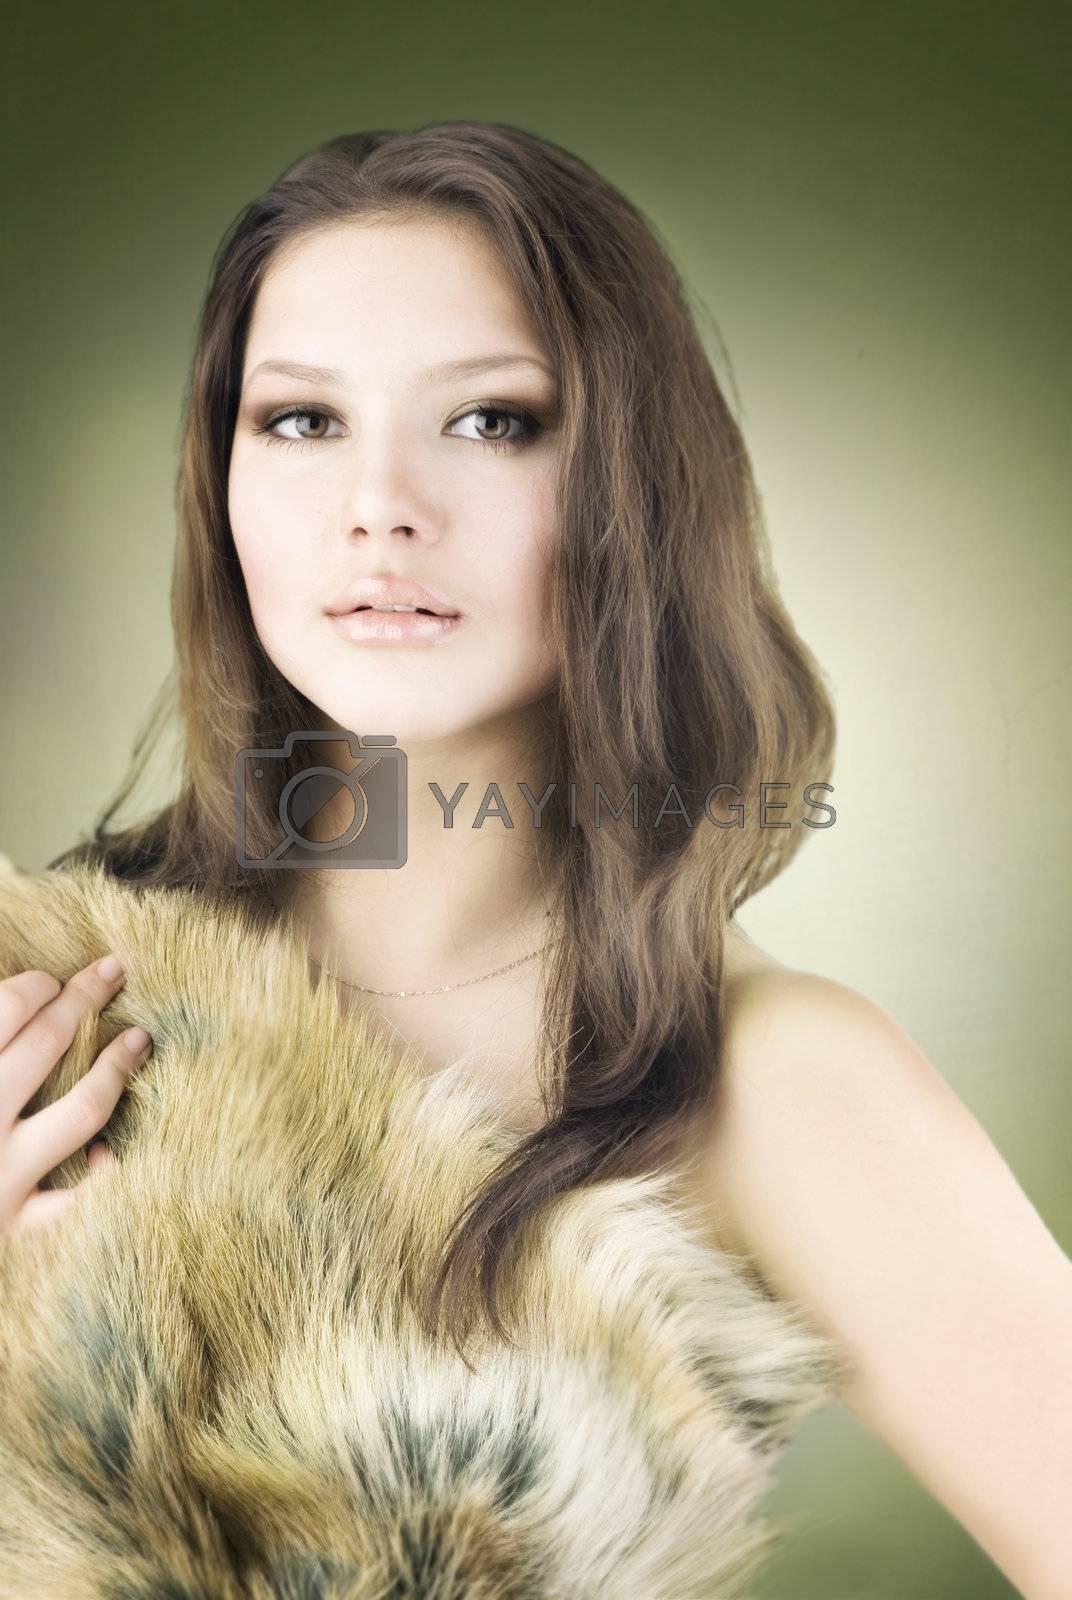 Beautiful Wild Girl Portrait